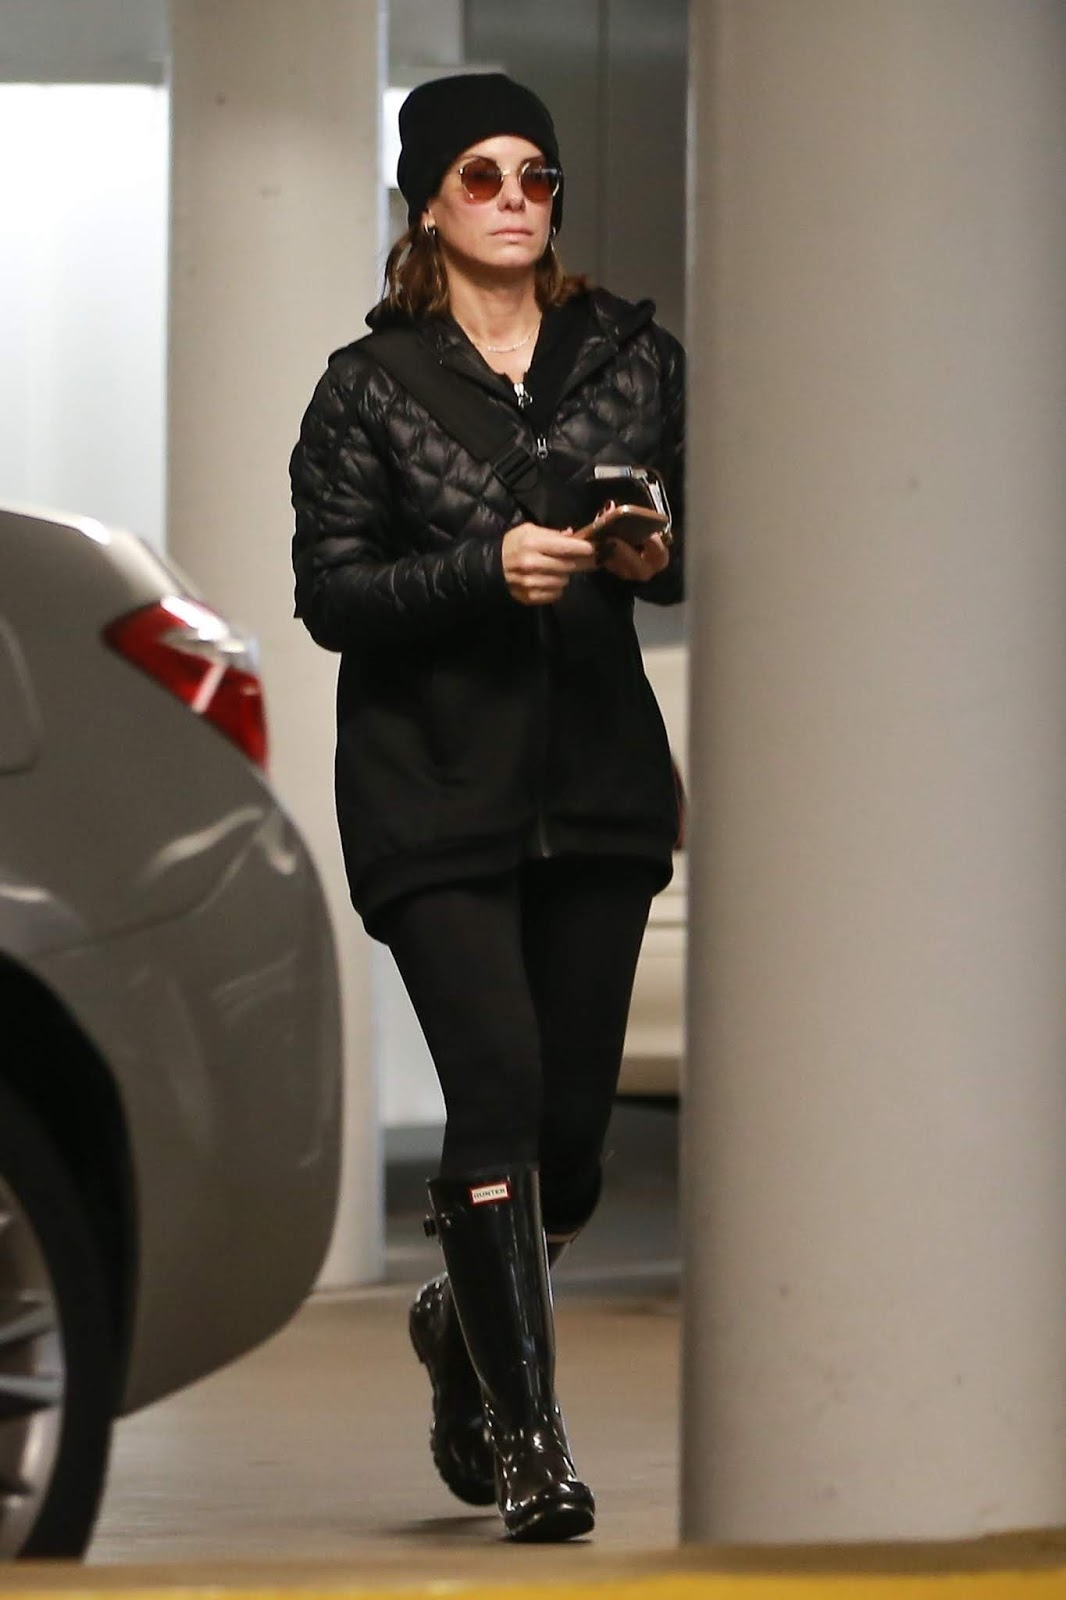 Sandra Bullock heads to a rainy day meeting in Los Angeles - 01/15/2019.